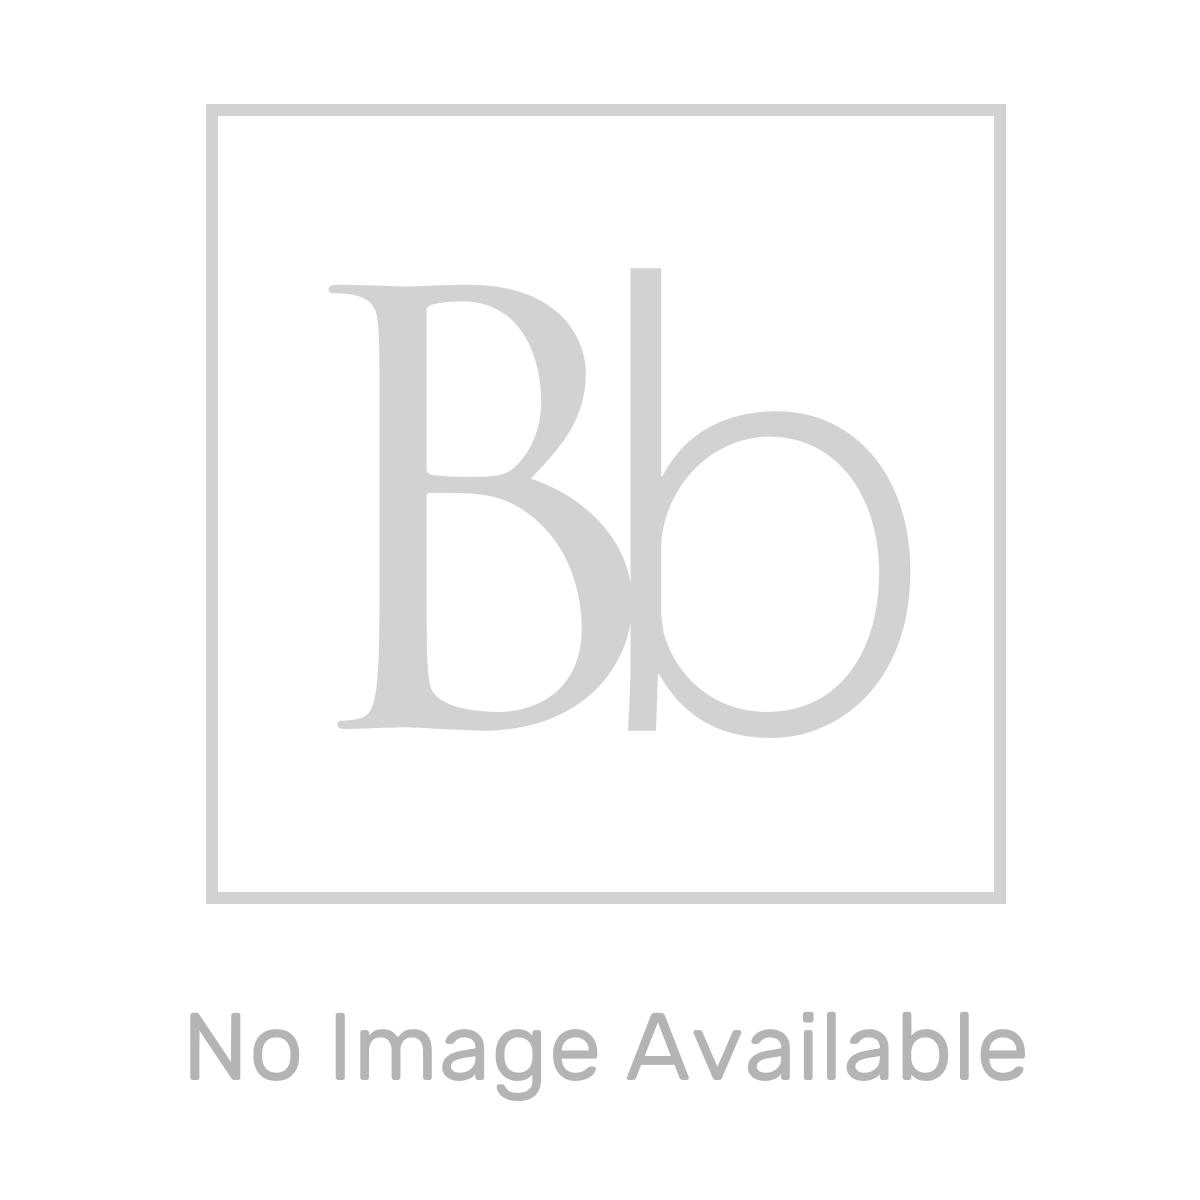 RAK Obelisk Ecofix Black Cistern Wall Hung Bidet Cabinet Measurements